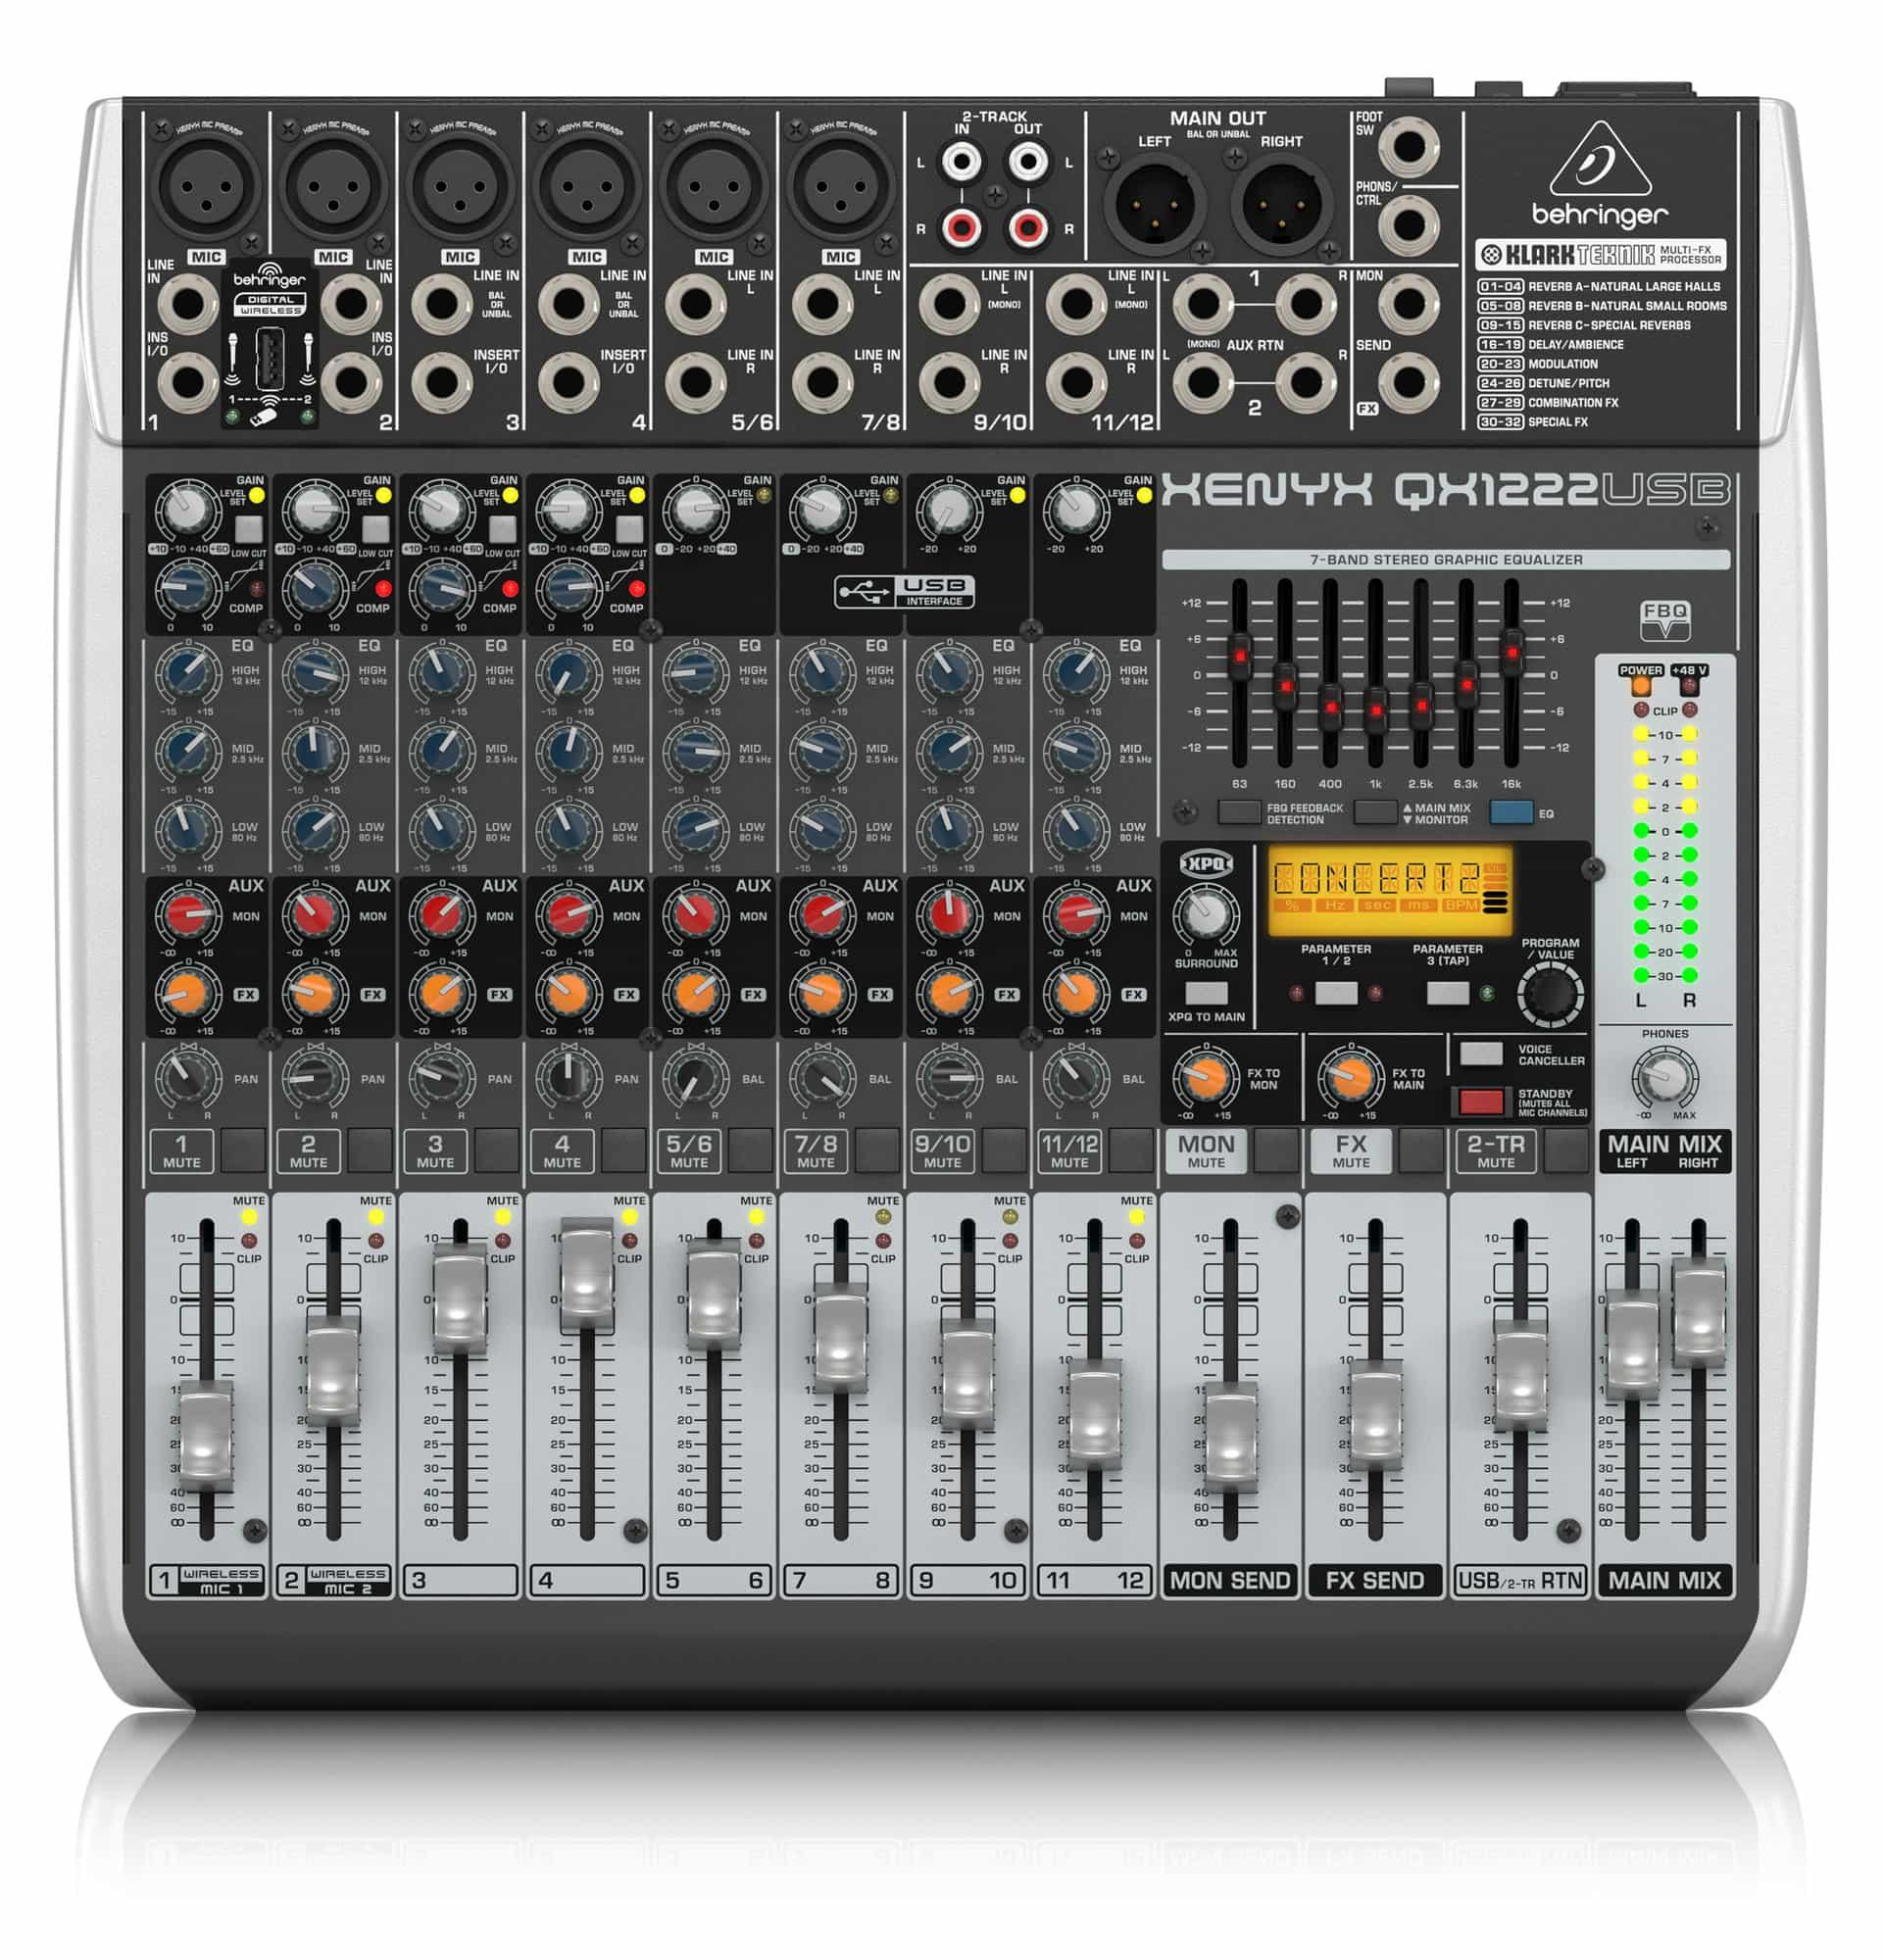 Mischpulte - Behringer Xenyx QX1222 USB Mischpult - Onlineshop Musikhaus Kirstein